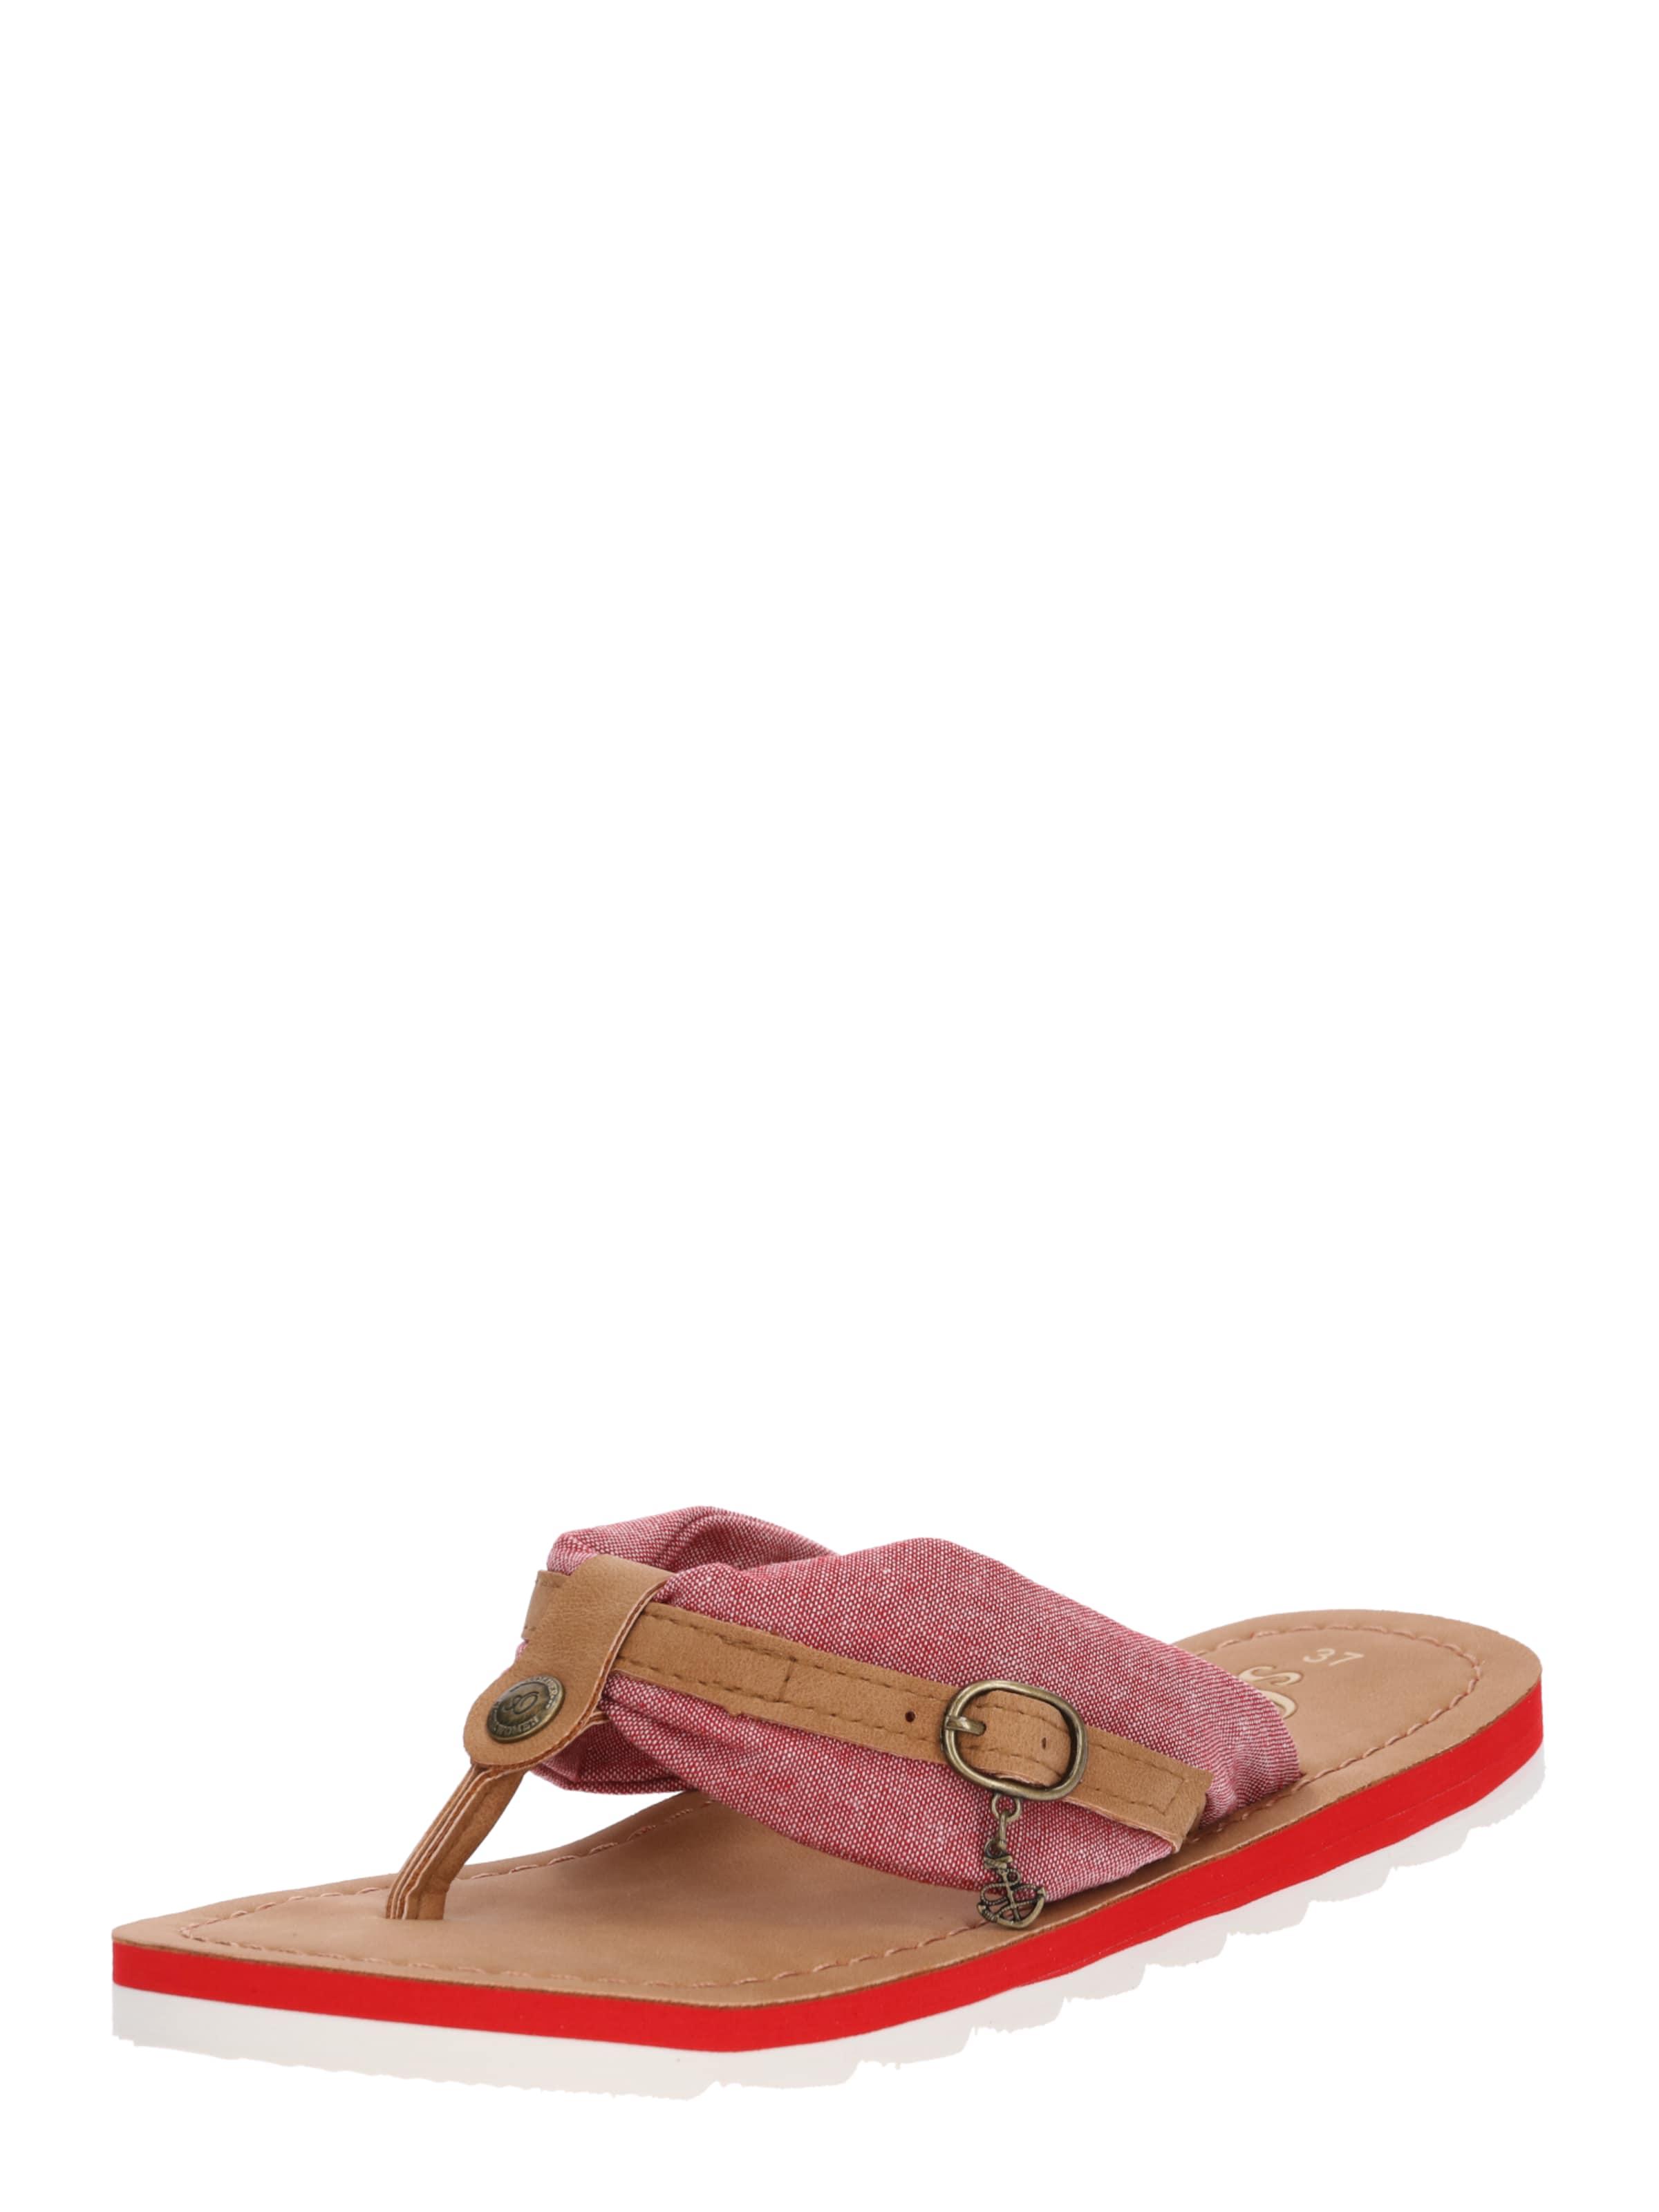 S.oliver Étiquette Rouge Brun / Rouge Bascule nD4TqOZSFP